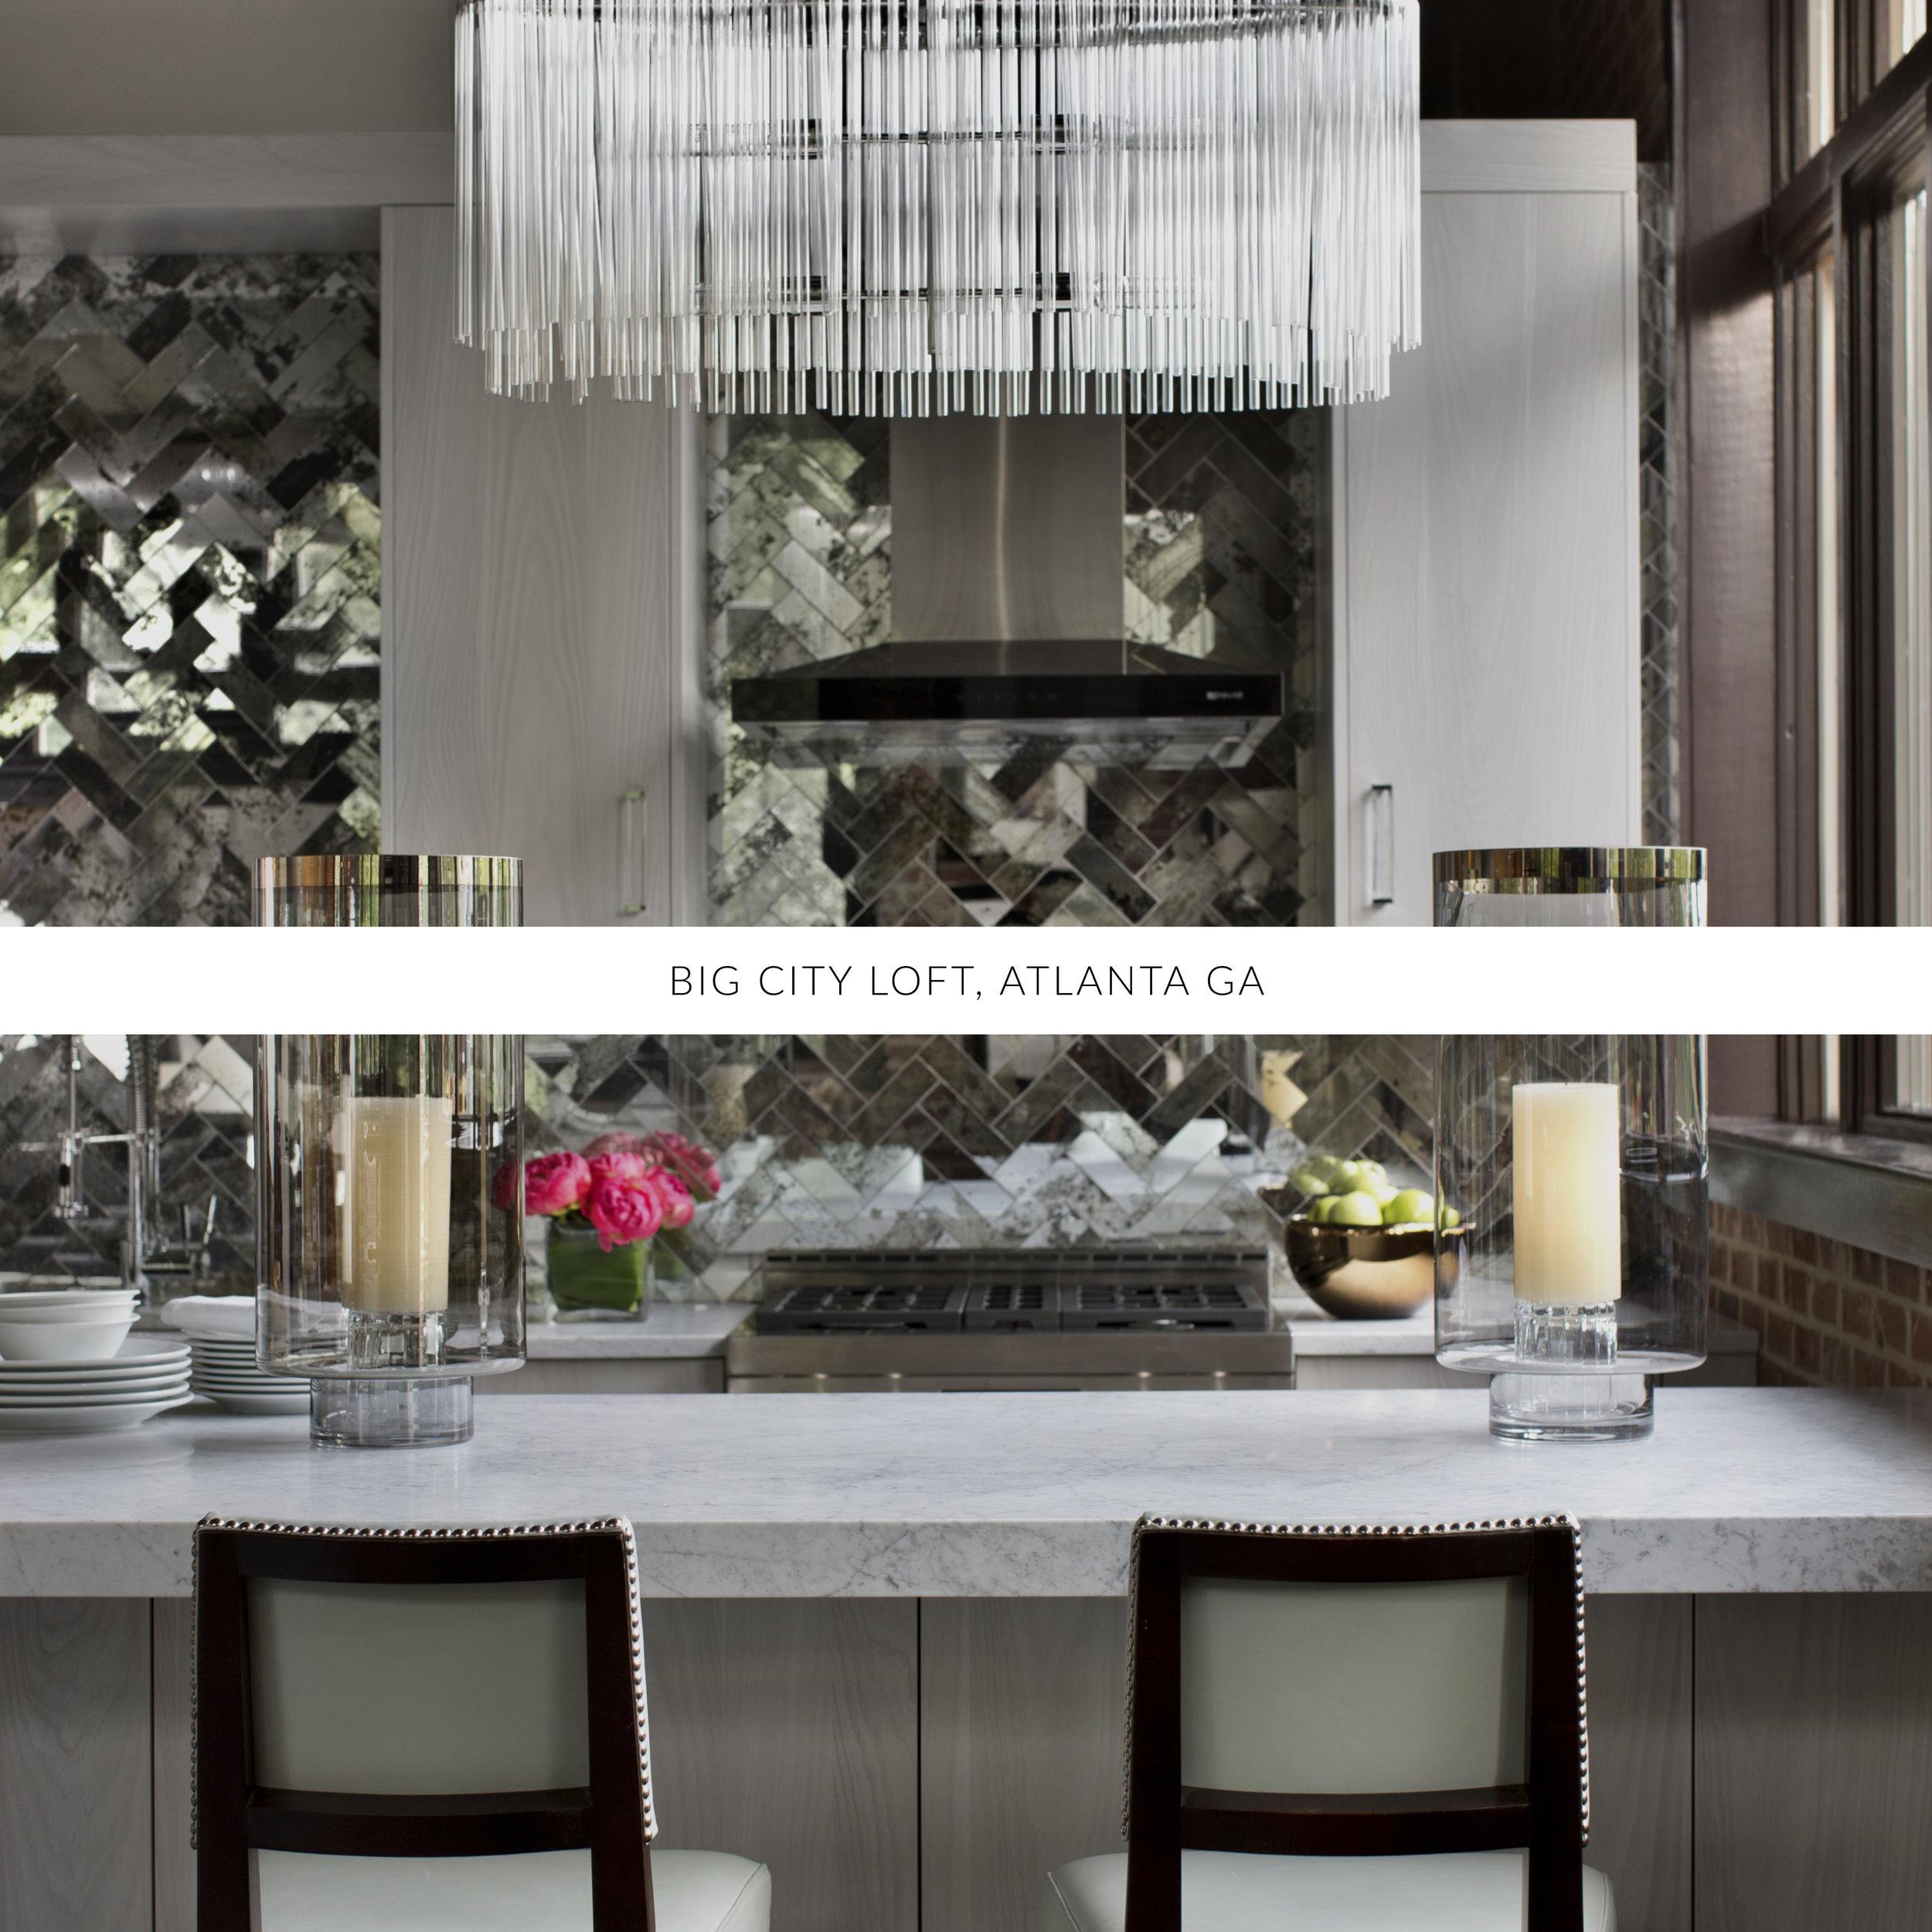 © Big City Loft, Traci Rhoads Interior Design, Private Residences and Golf &Country Clubs, Athens, GA